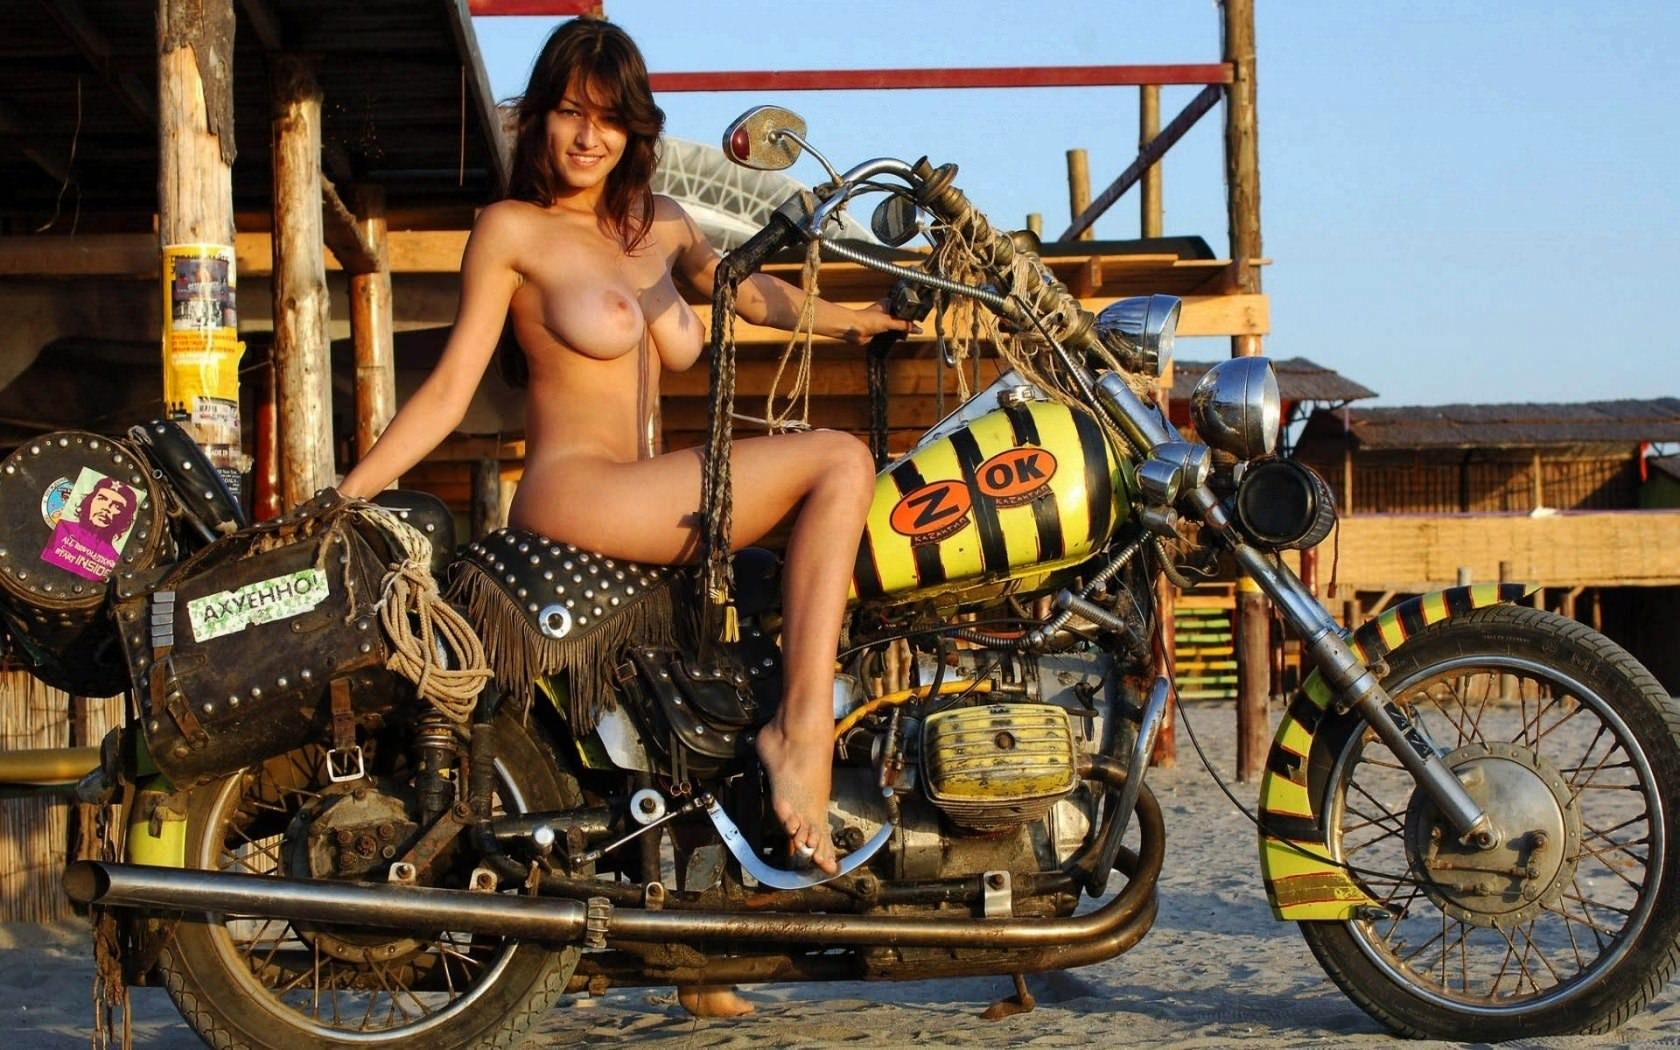 Boobs Motorcycles